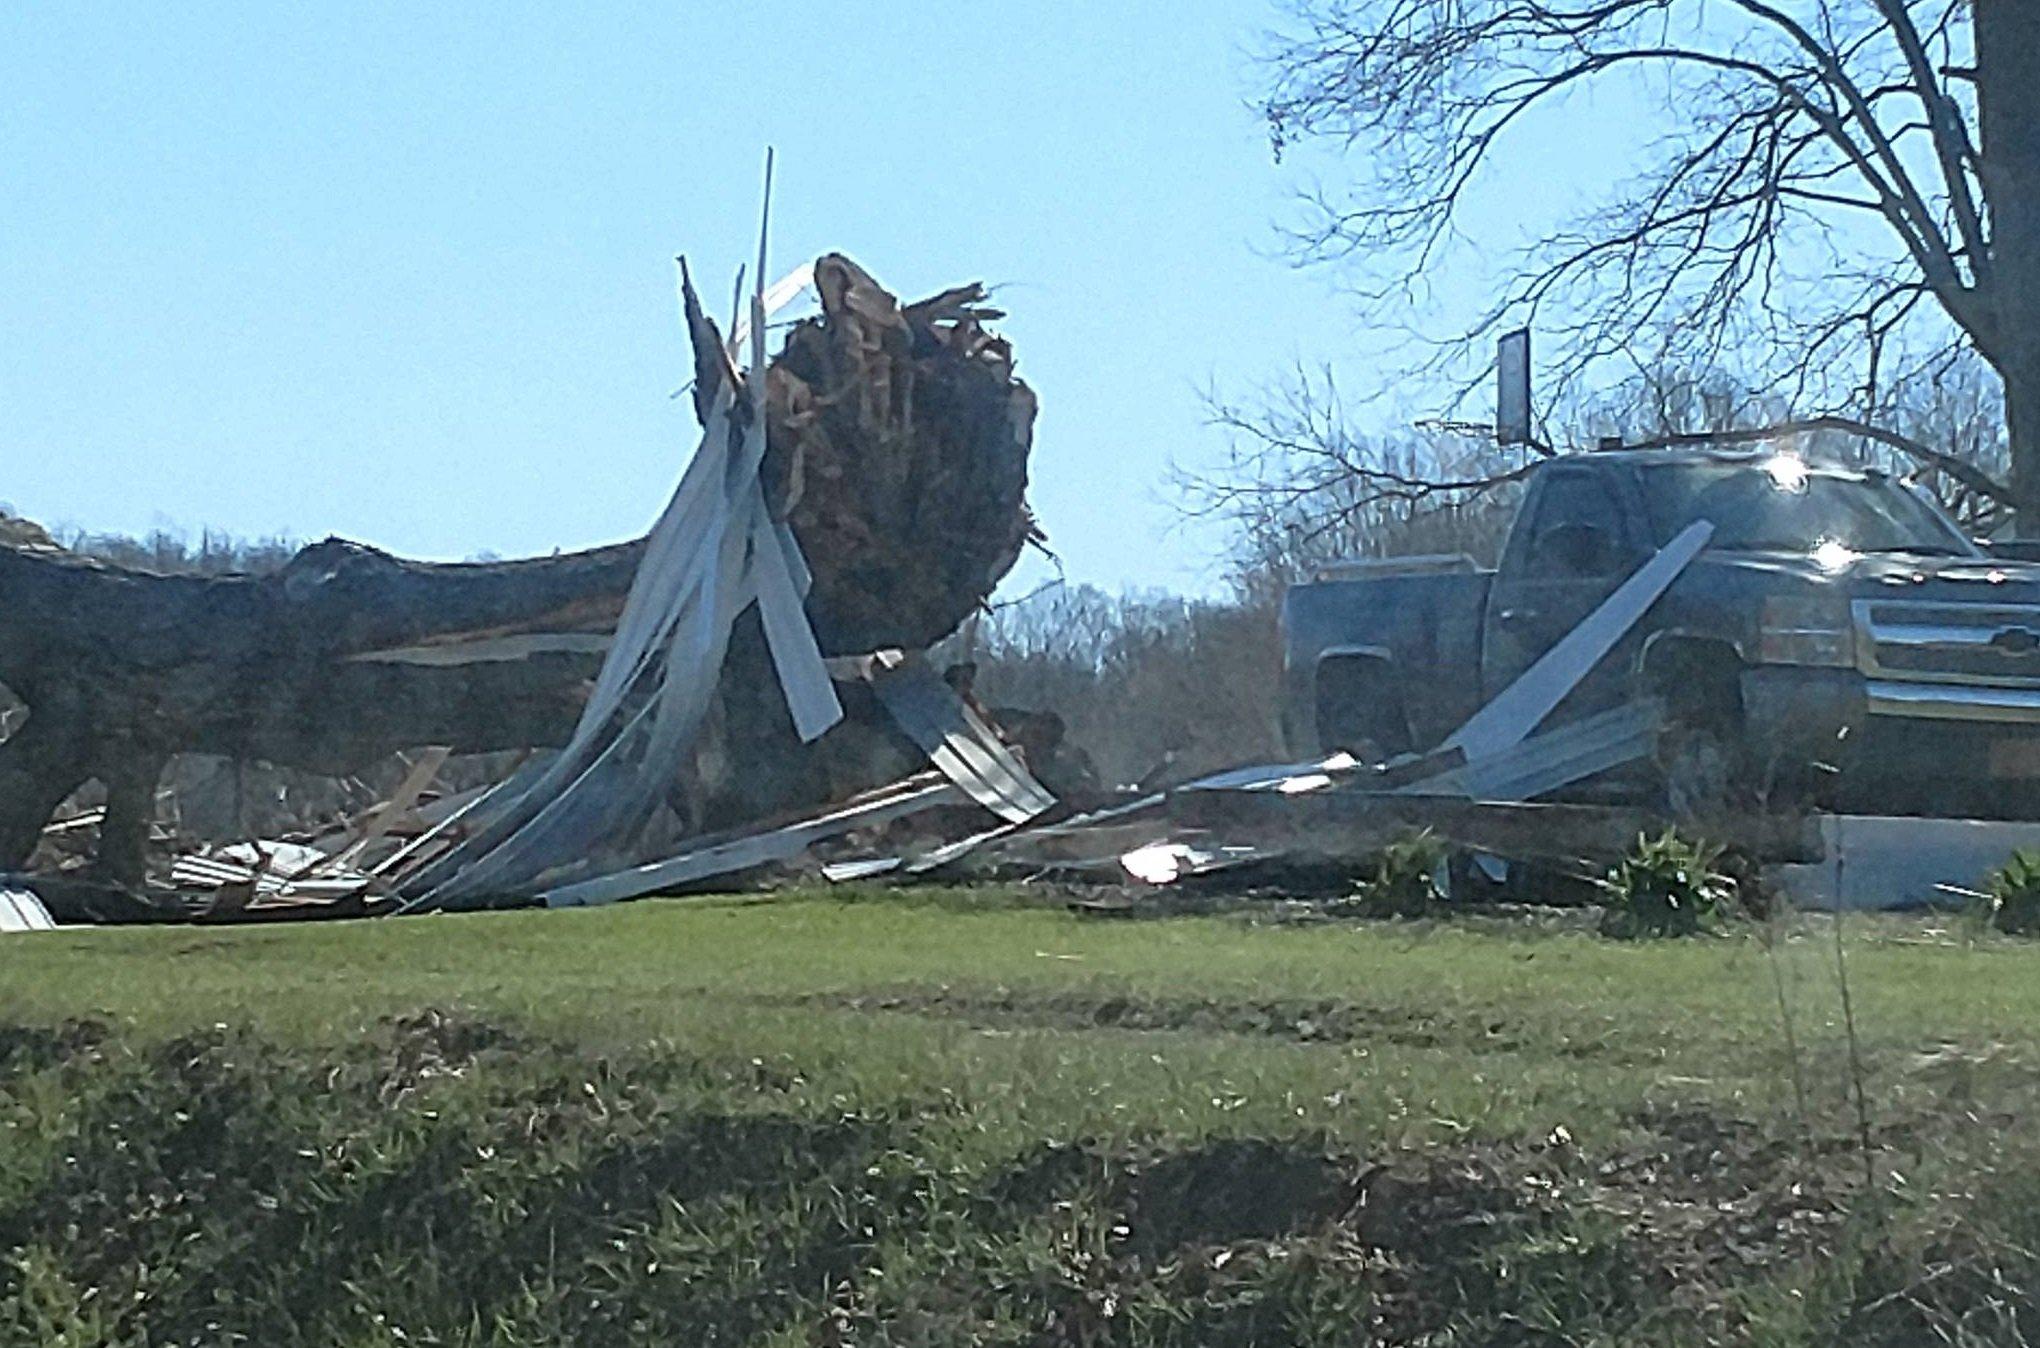 Tennessee carroll county clarksburg - Tennessee Carroll County Clarksburg 8